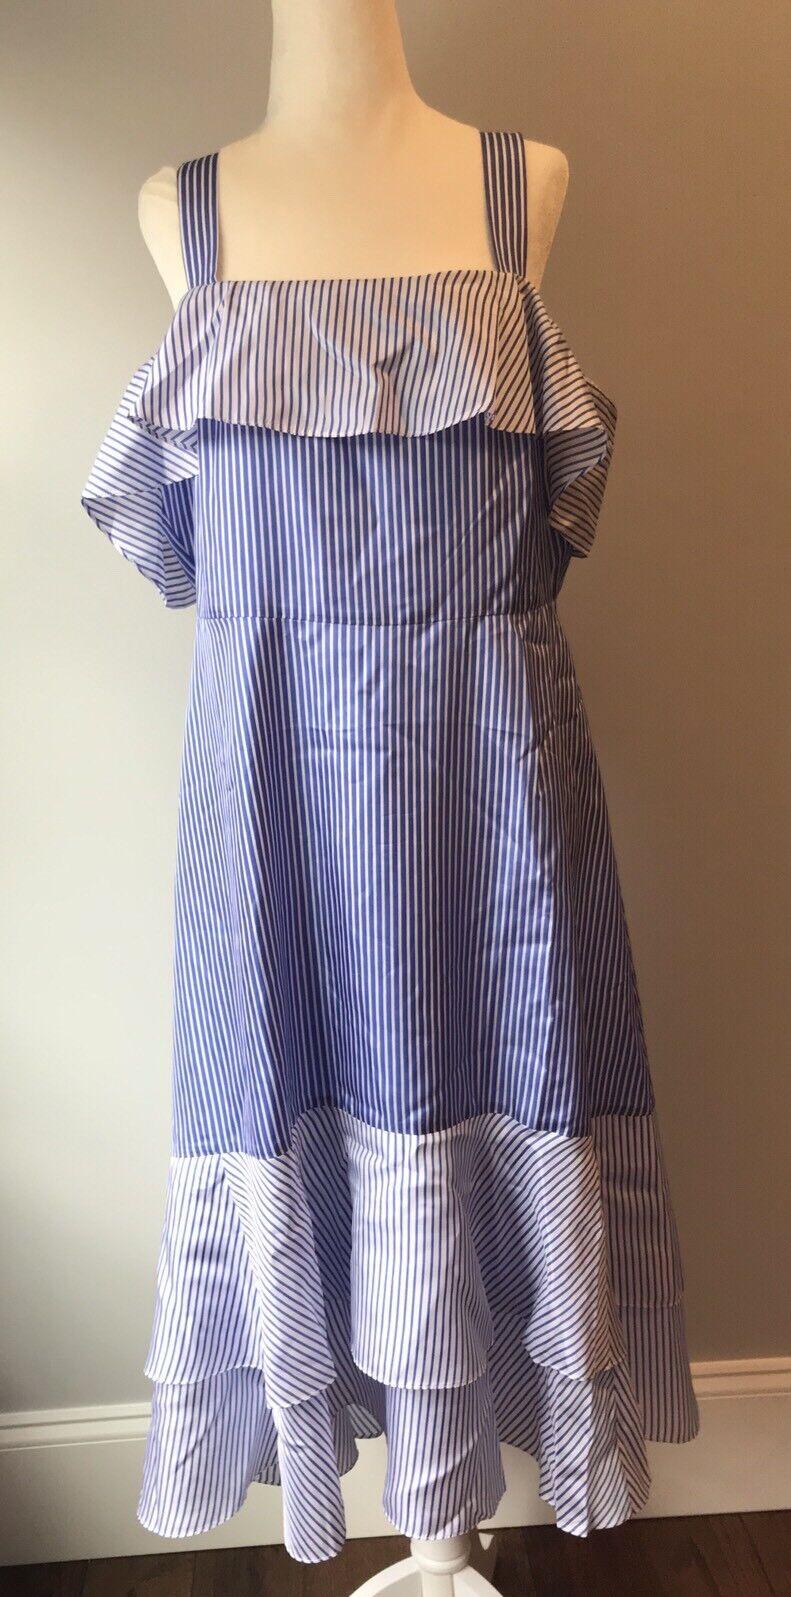 NEW J. CREW STRIPED COL-SHOULDER SILK DRESS IN blueE SZ 14  188 G6263